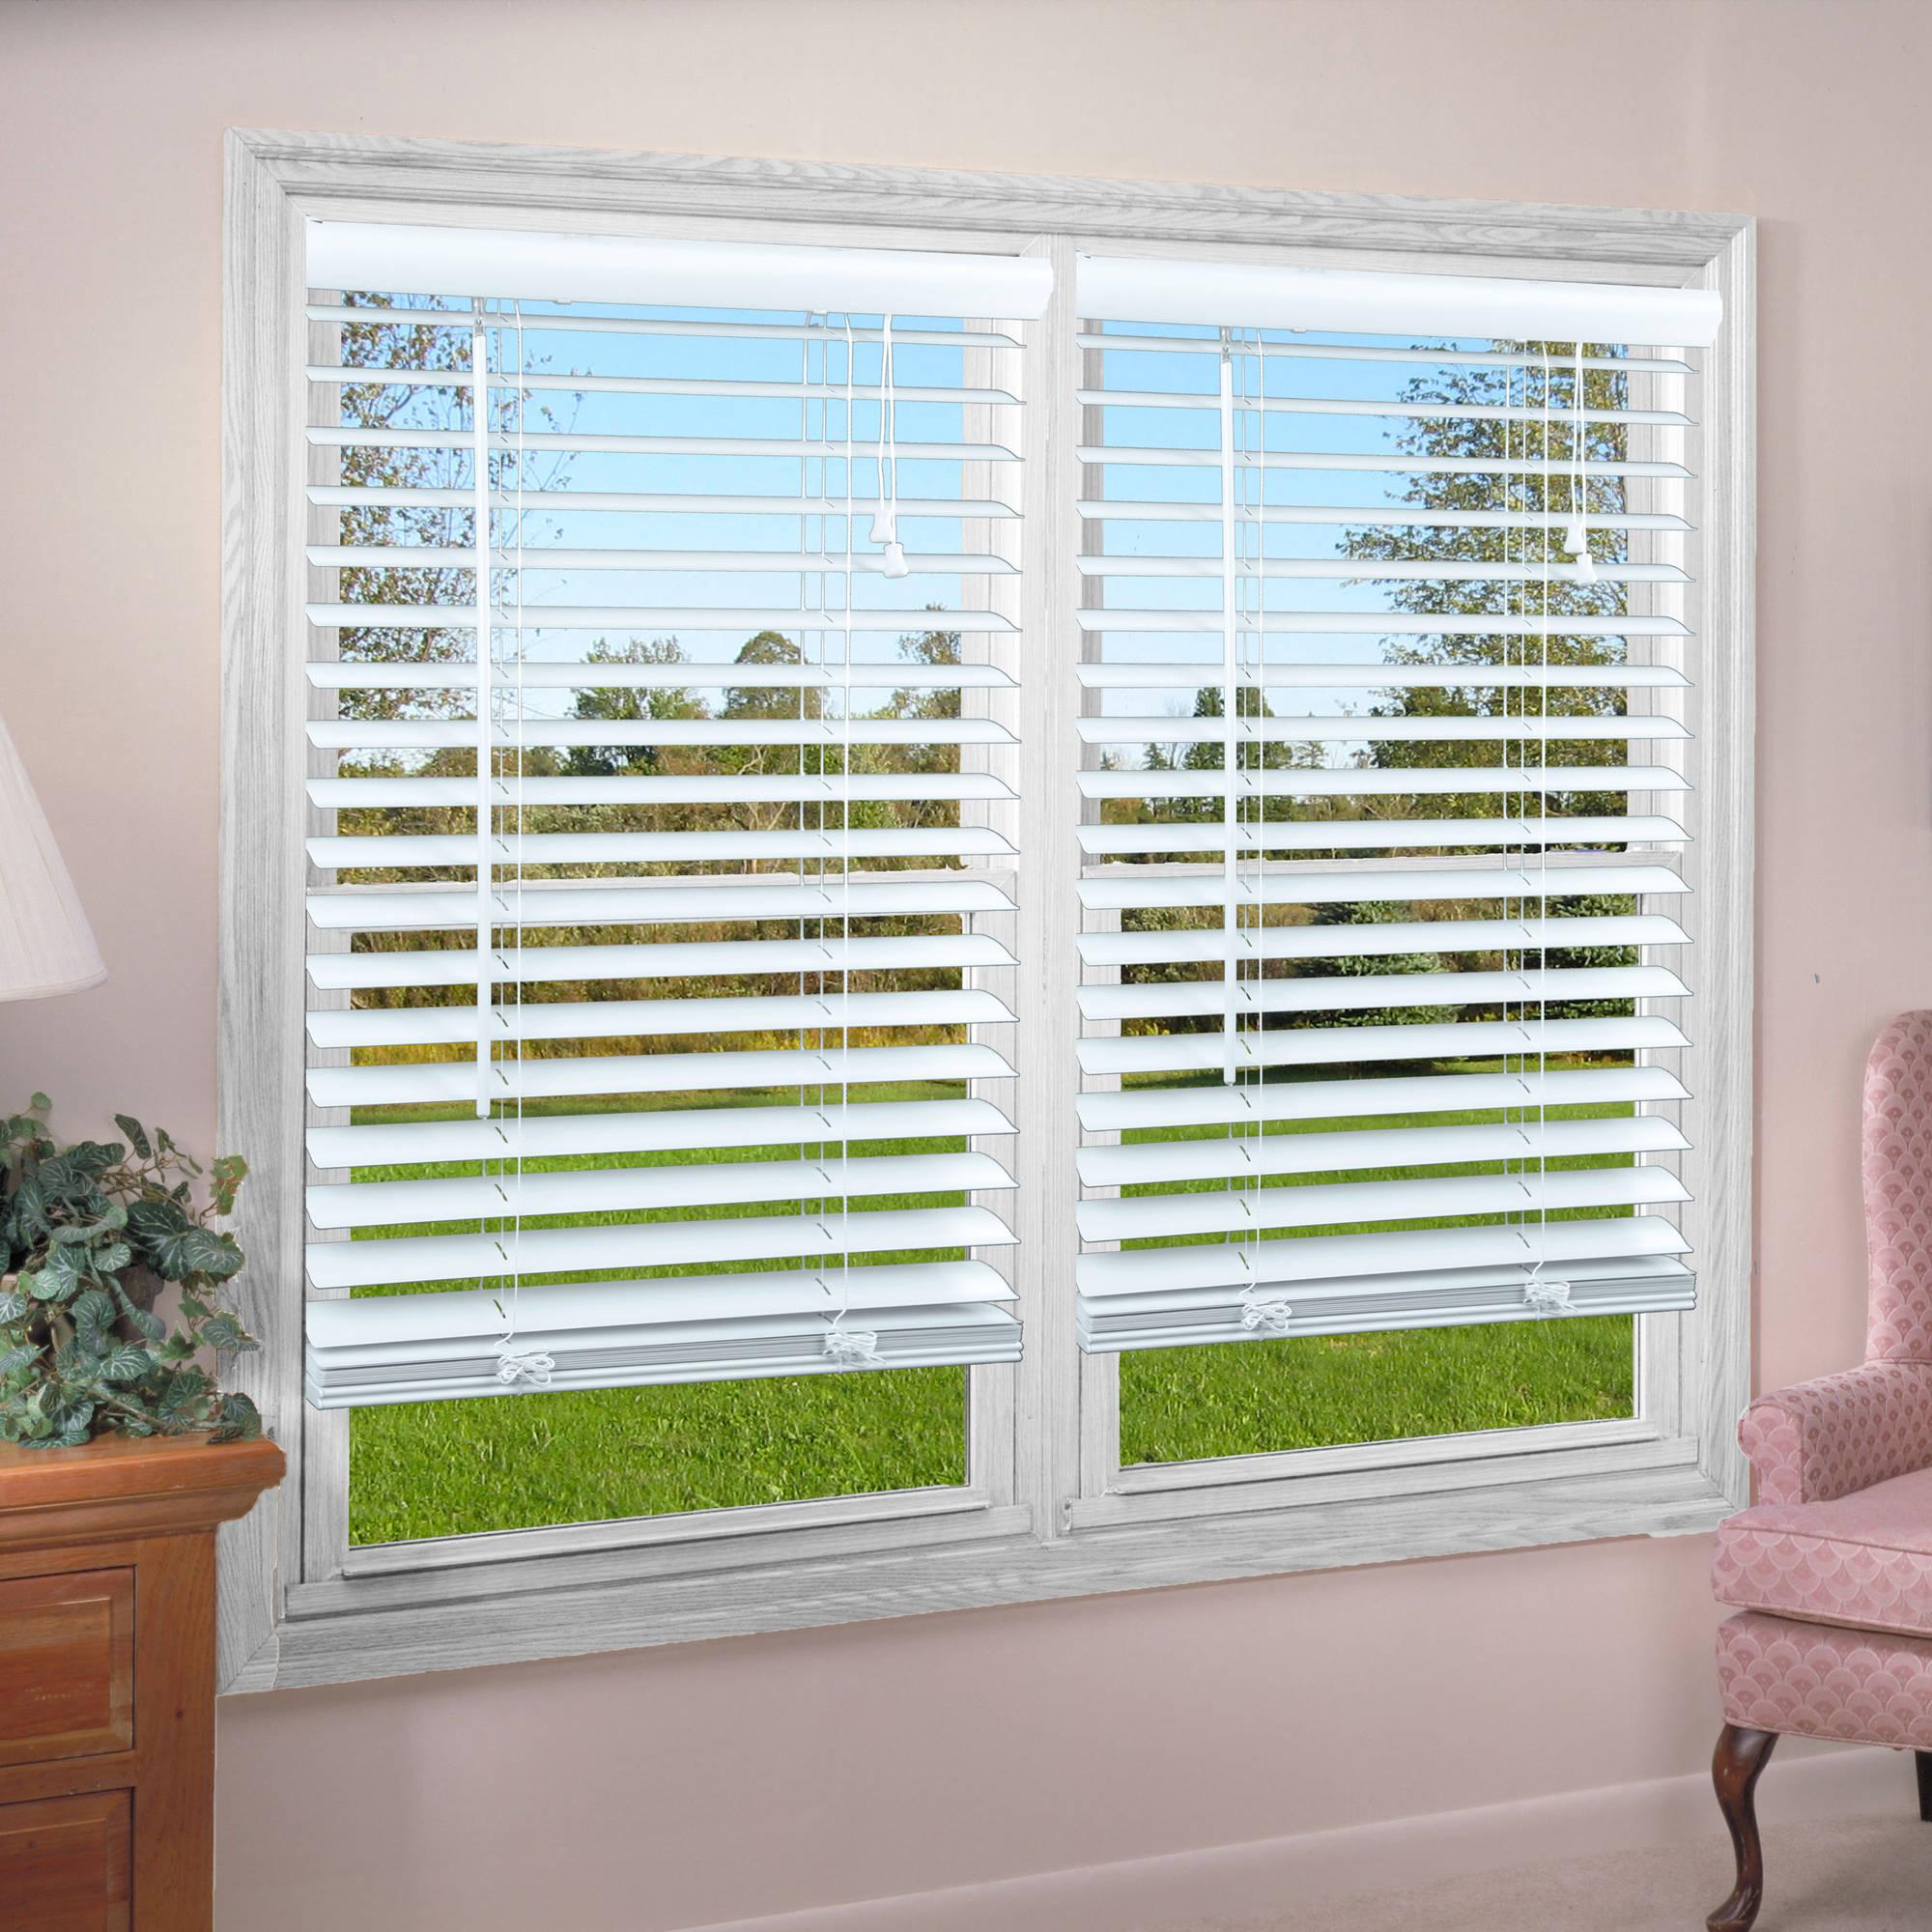 window blind easy install magnetic window blinds 25x68 inch - walmart.com UOHQJBA